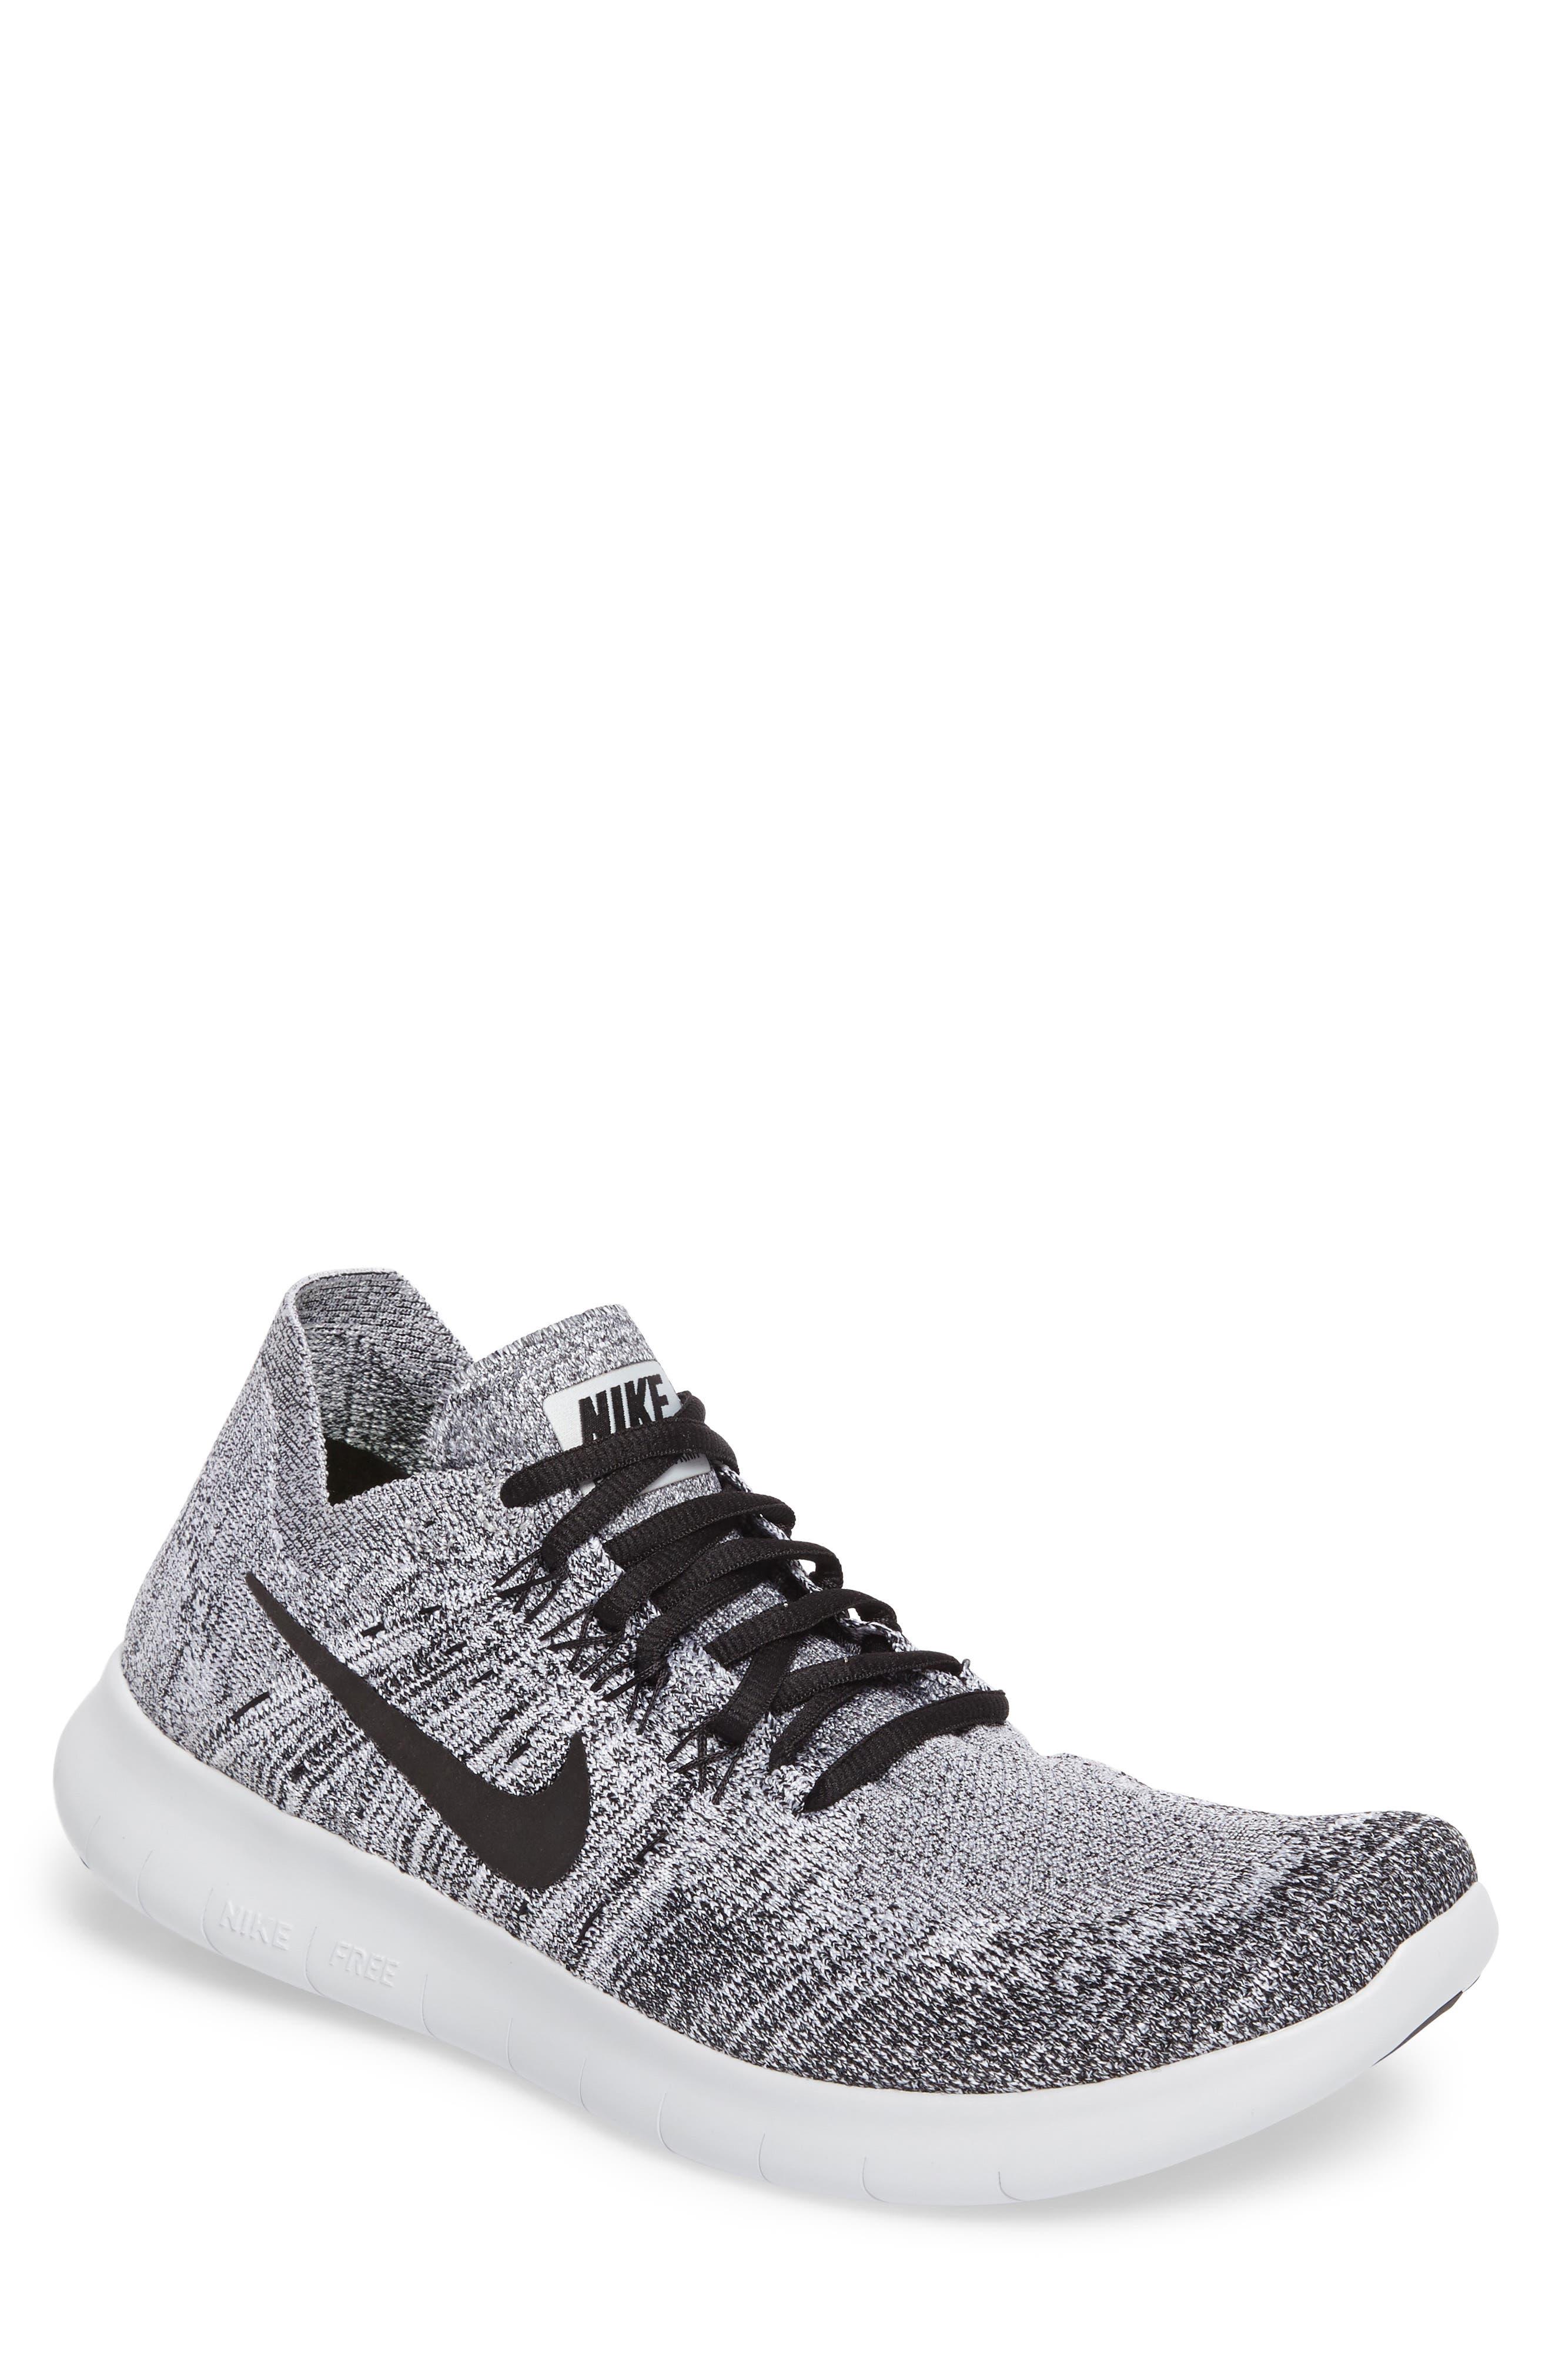 Free Run Flyknit 2017 Running Shoe,                         Main,                         color, White/ Black/Stealth/Platinum